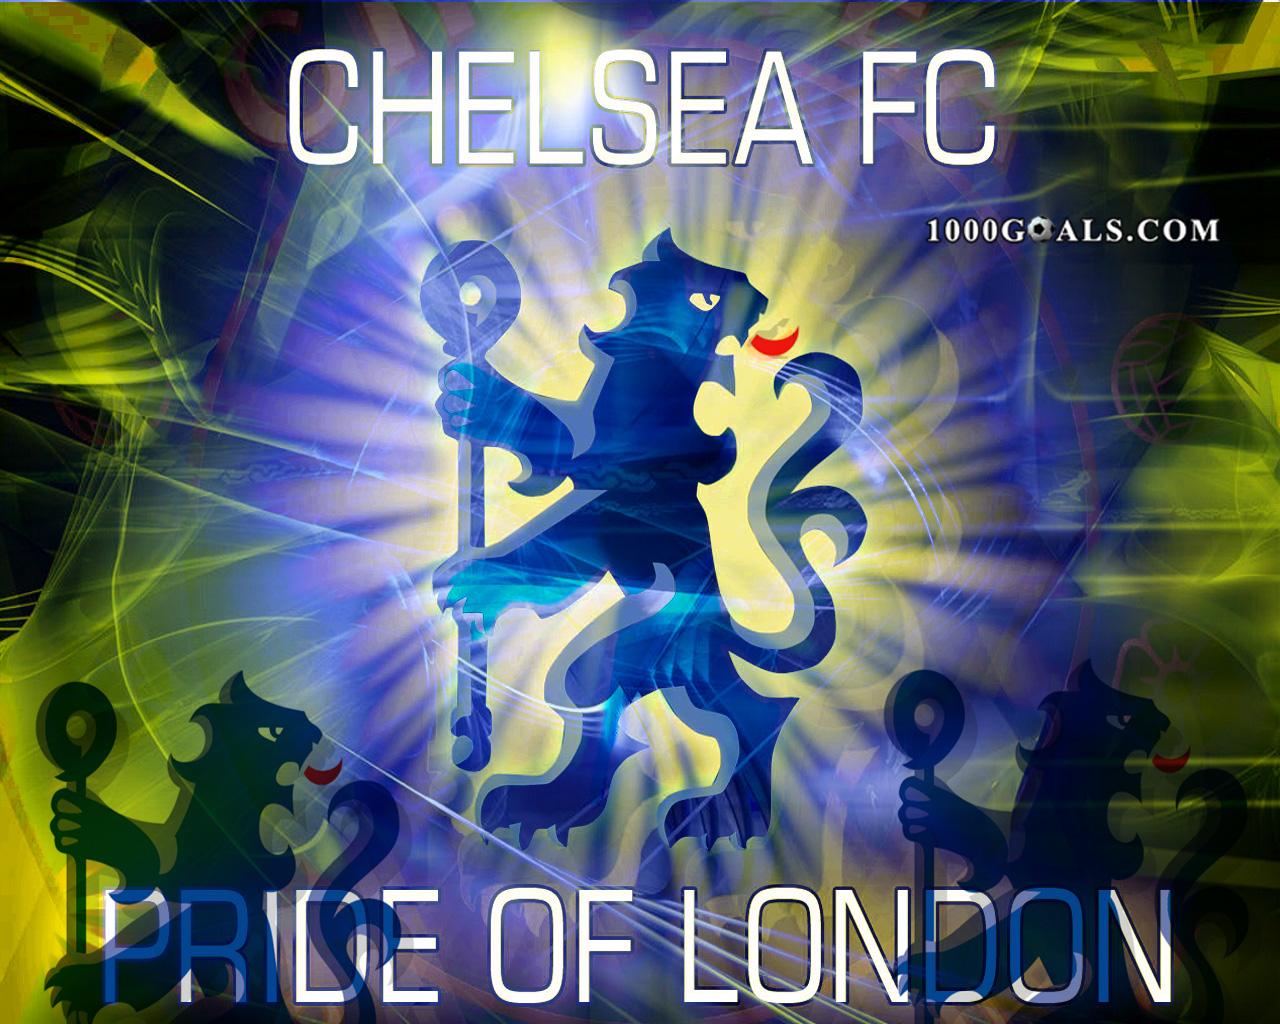 http://3.bp.blogspot.com/_b6SfIsuL8fc/TPtJ4C6Wl4I/AAAAAAAAAAw/_2UGE8T3FfY/s1600/Chelsea-FC-image-02.jpg